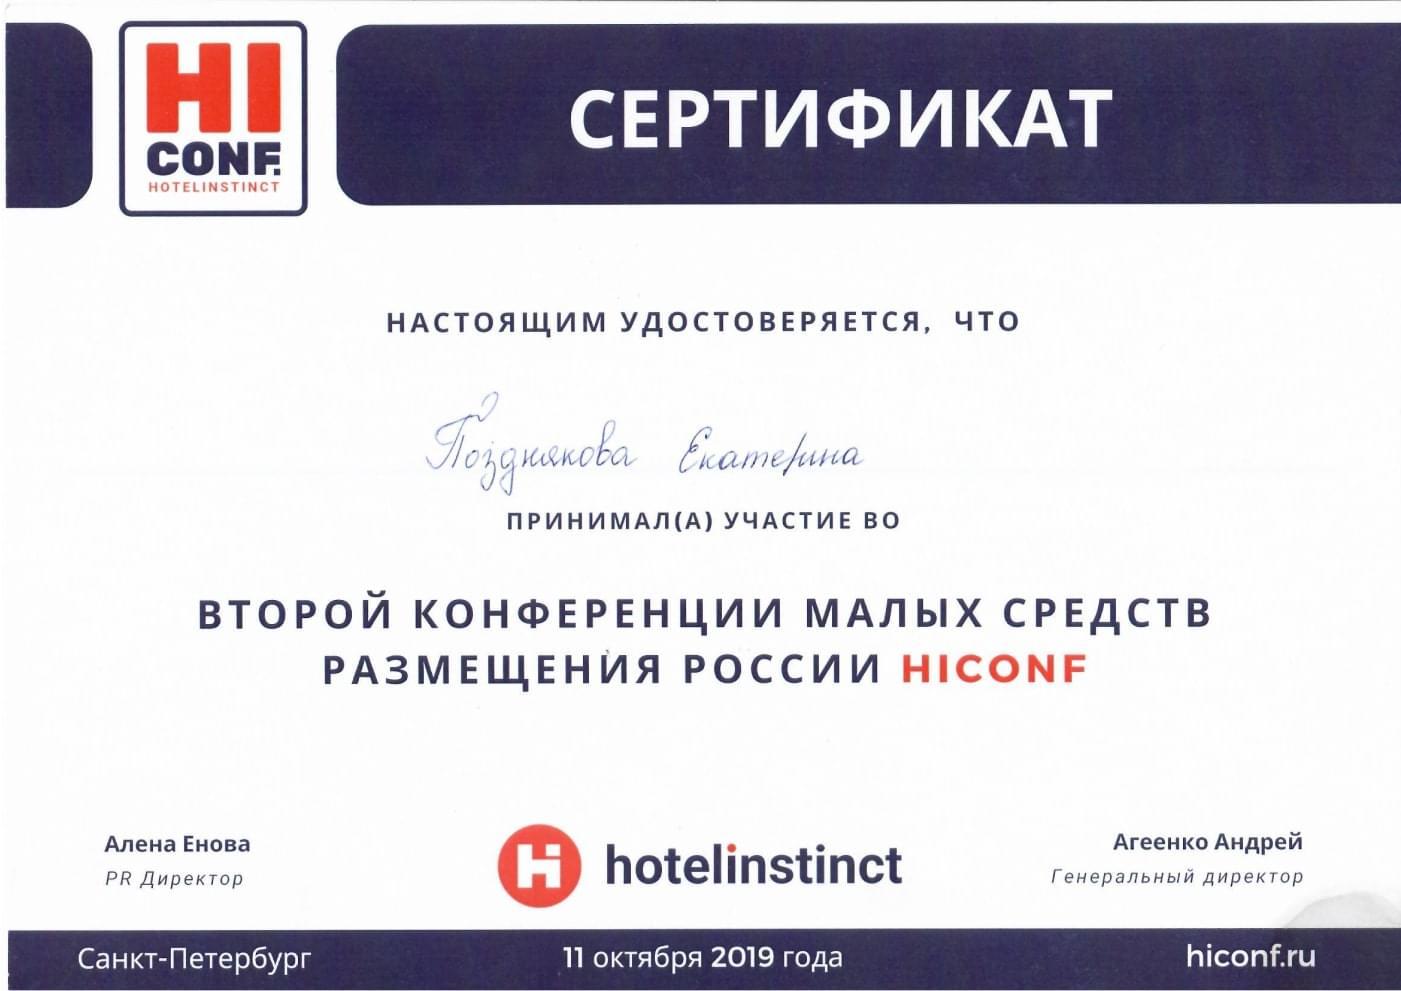 Сертификат от hiconf 2019